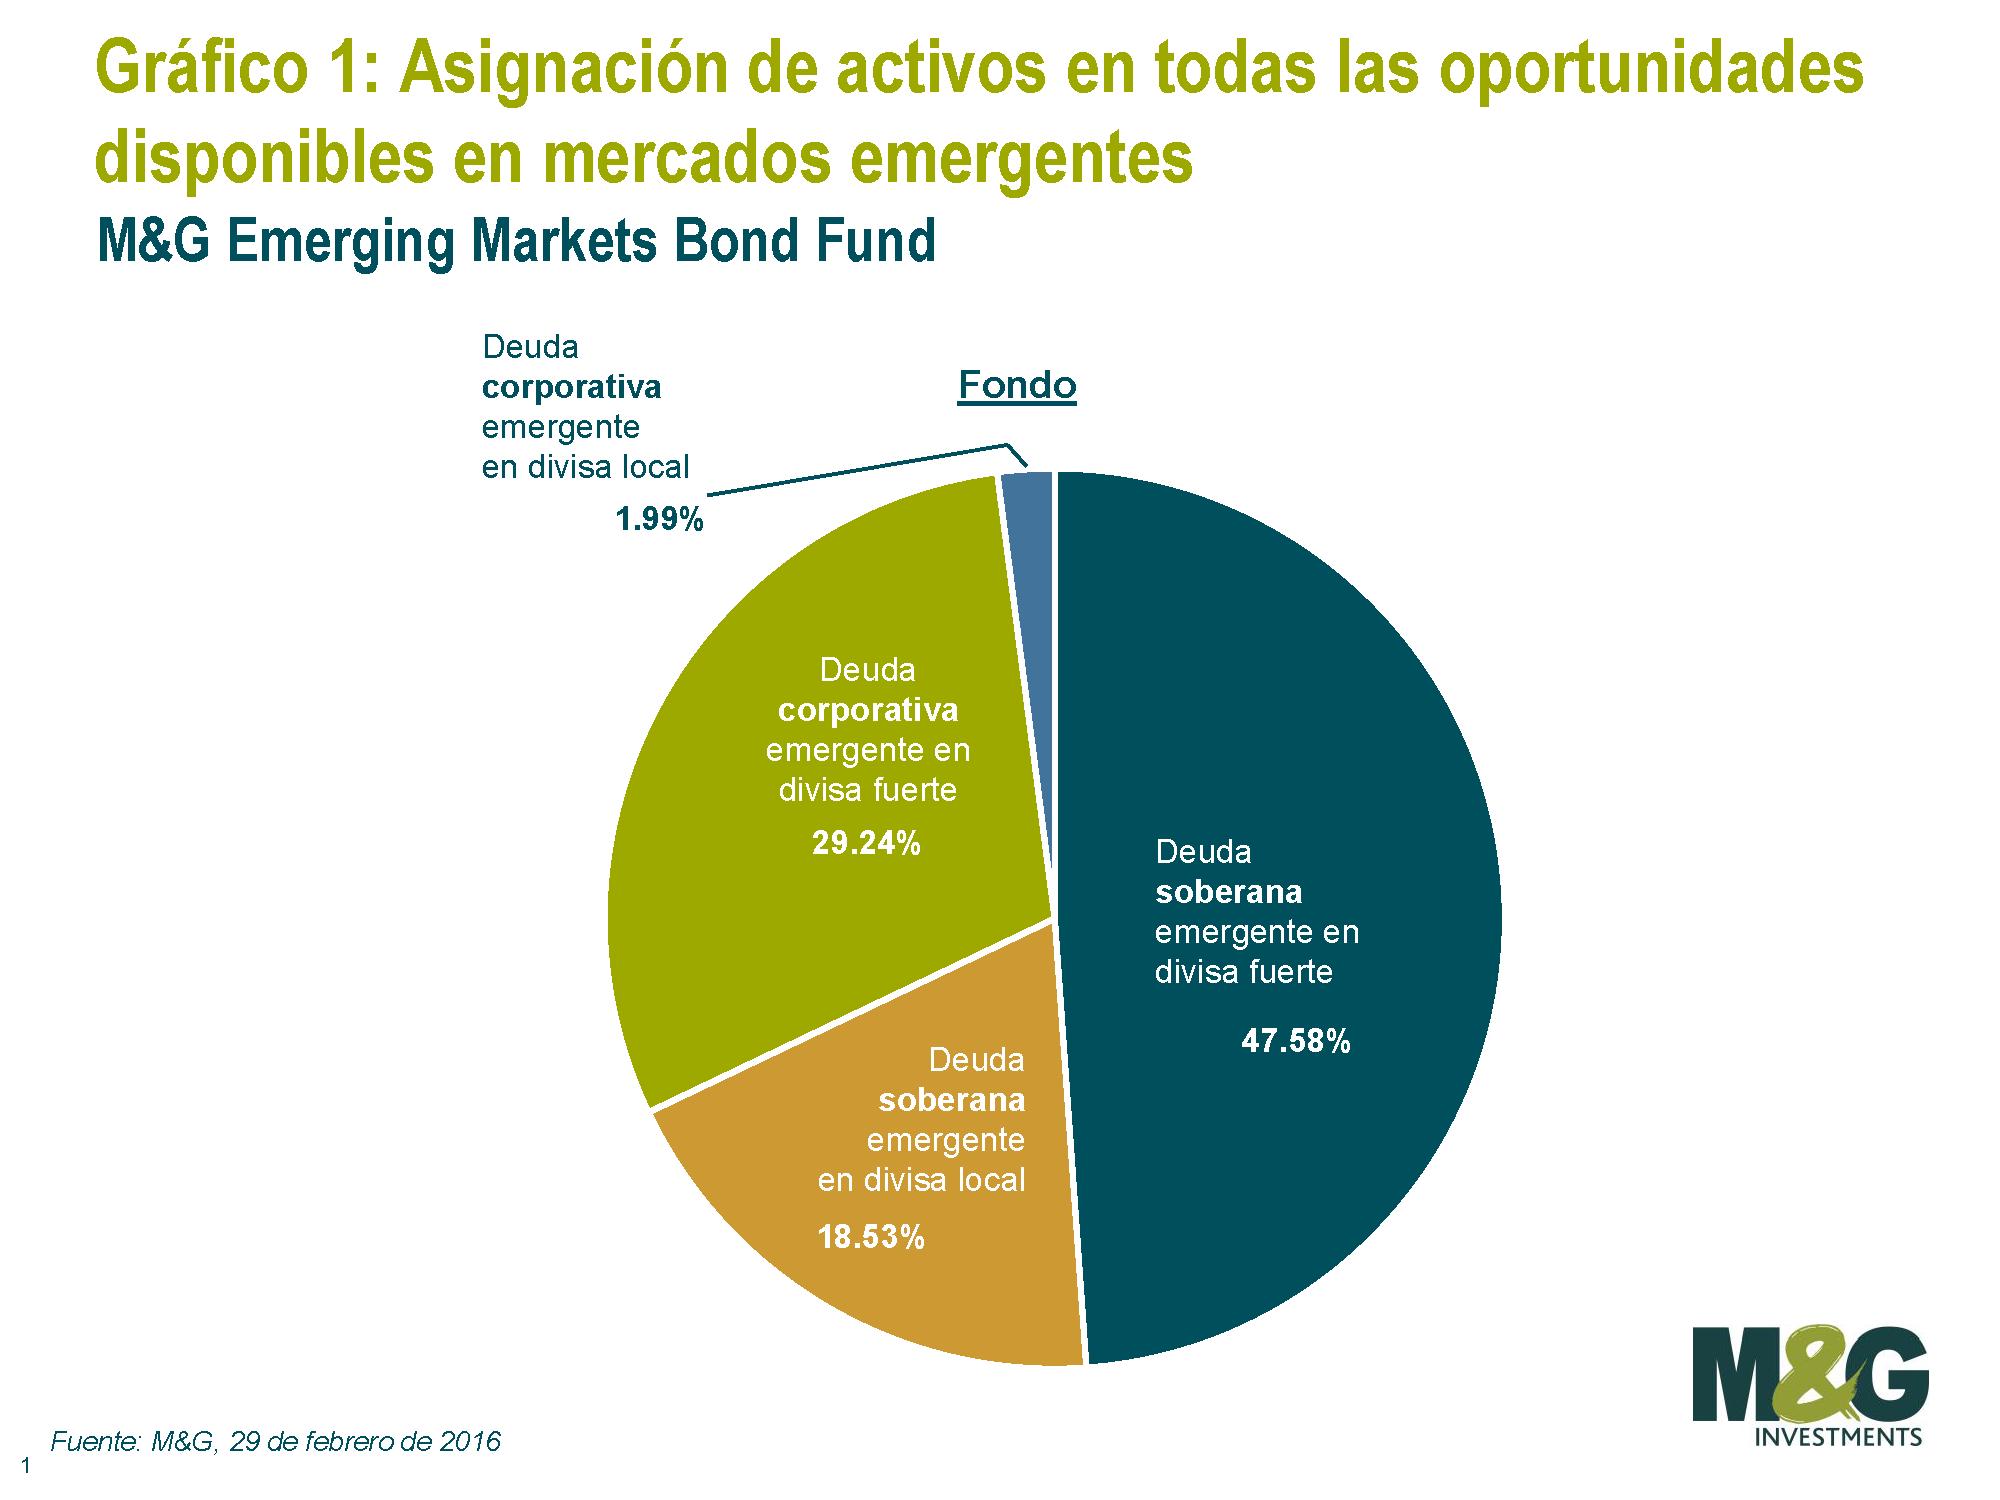 M&G Emerging Markets Bond